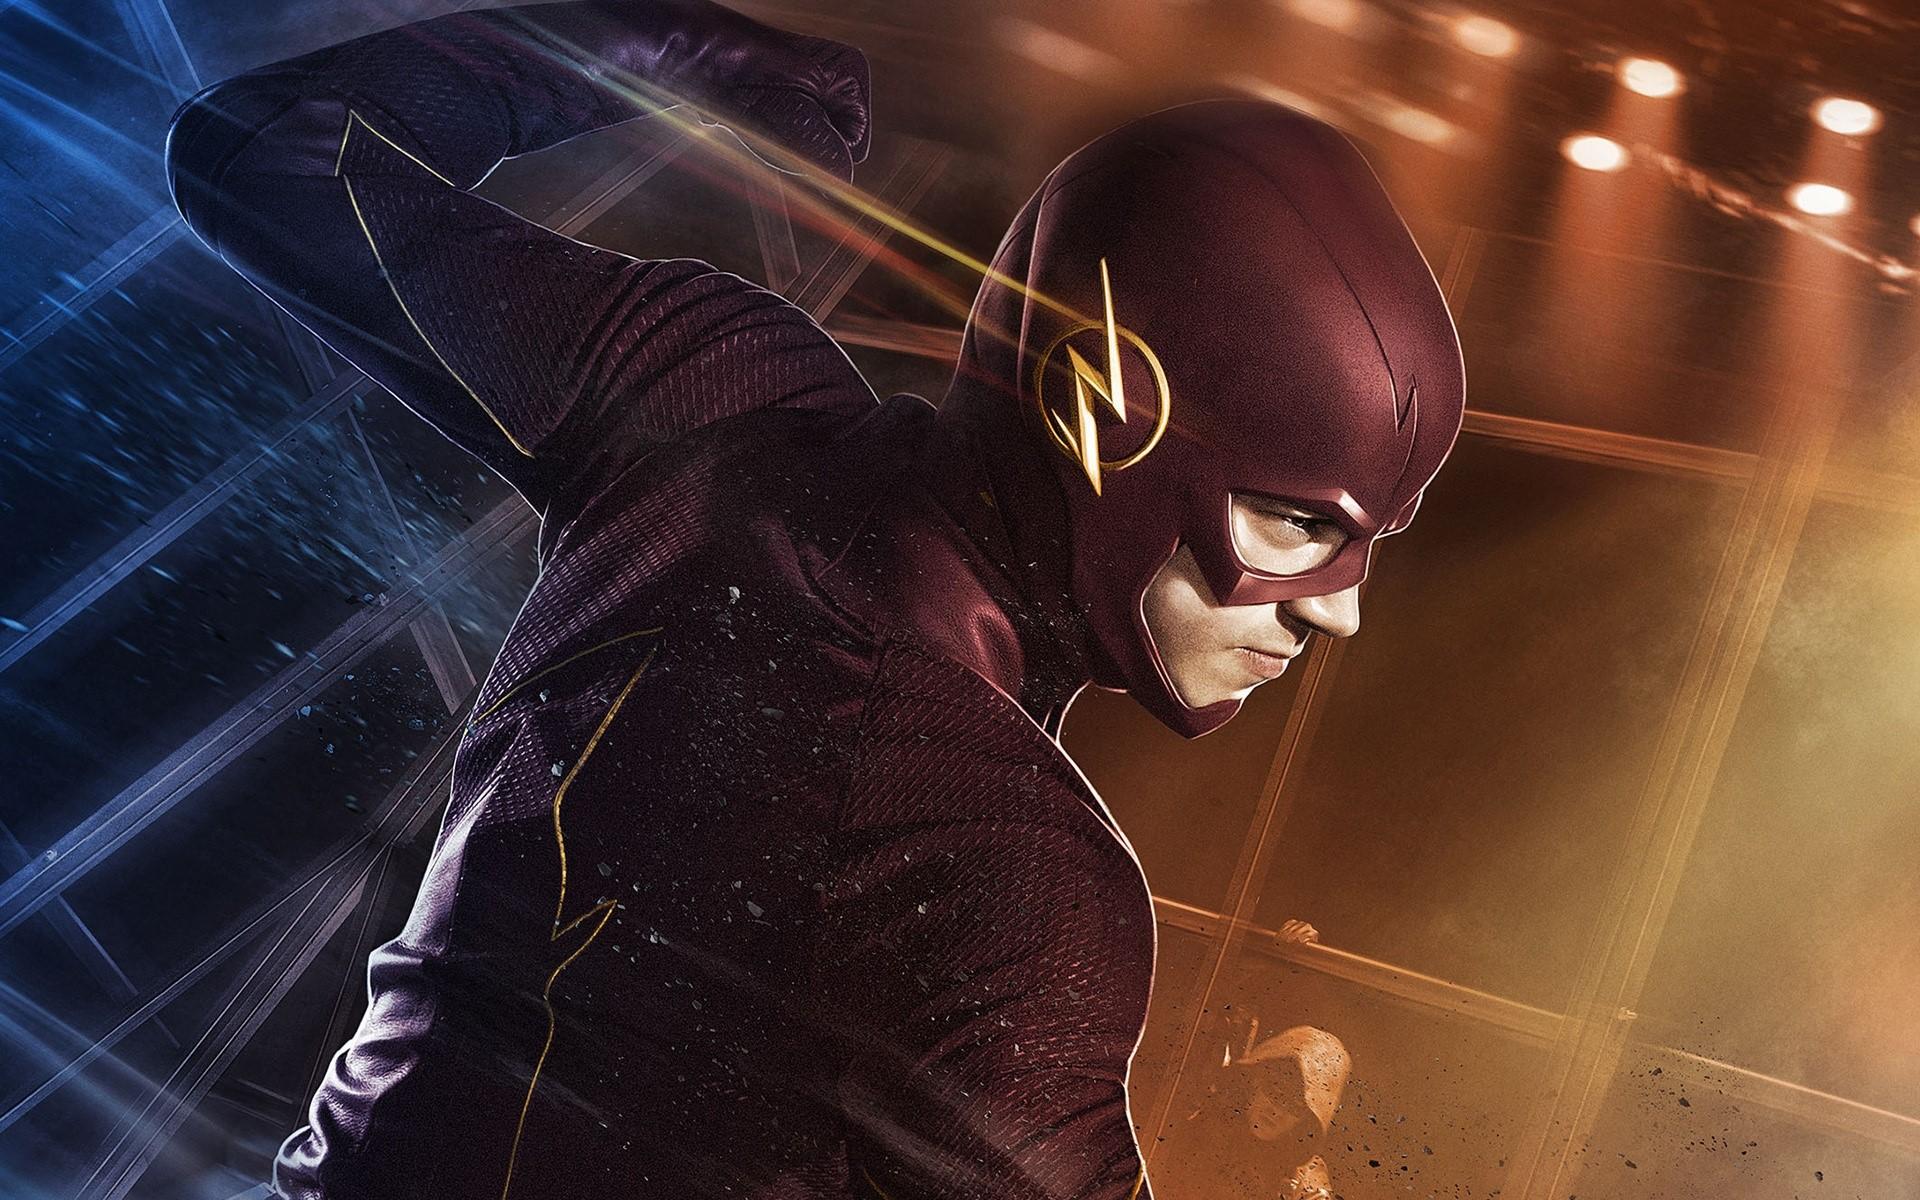 Wallpaper Grant Gustin as Flash